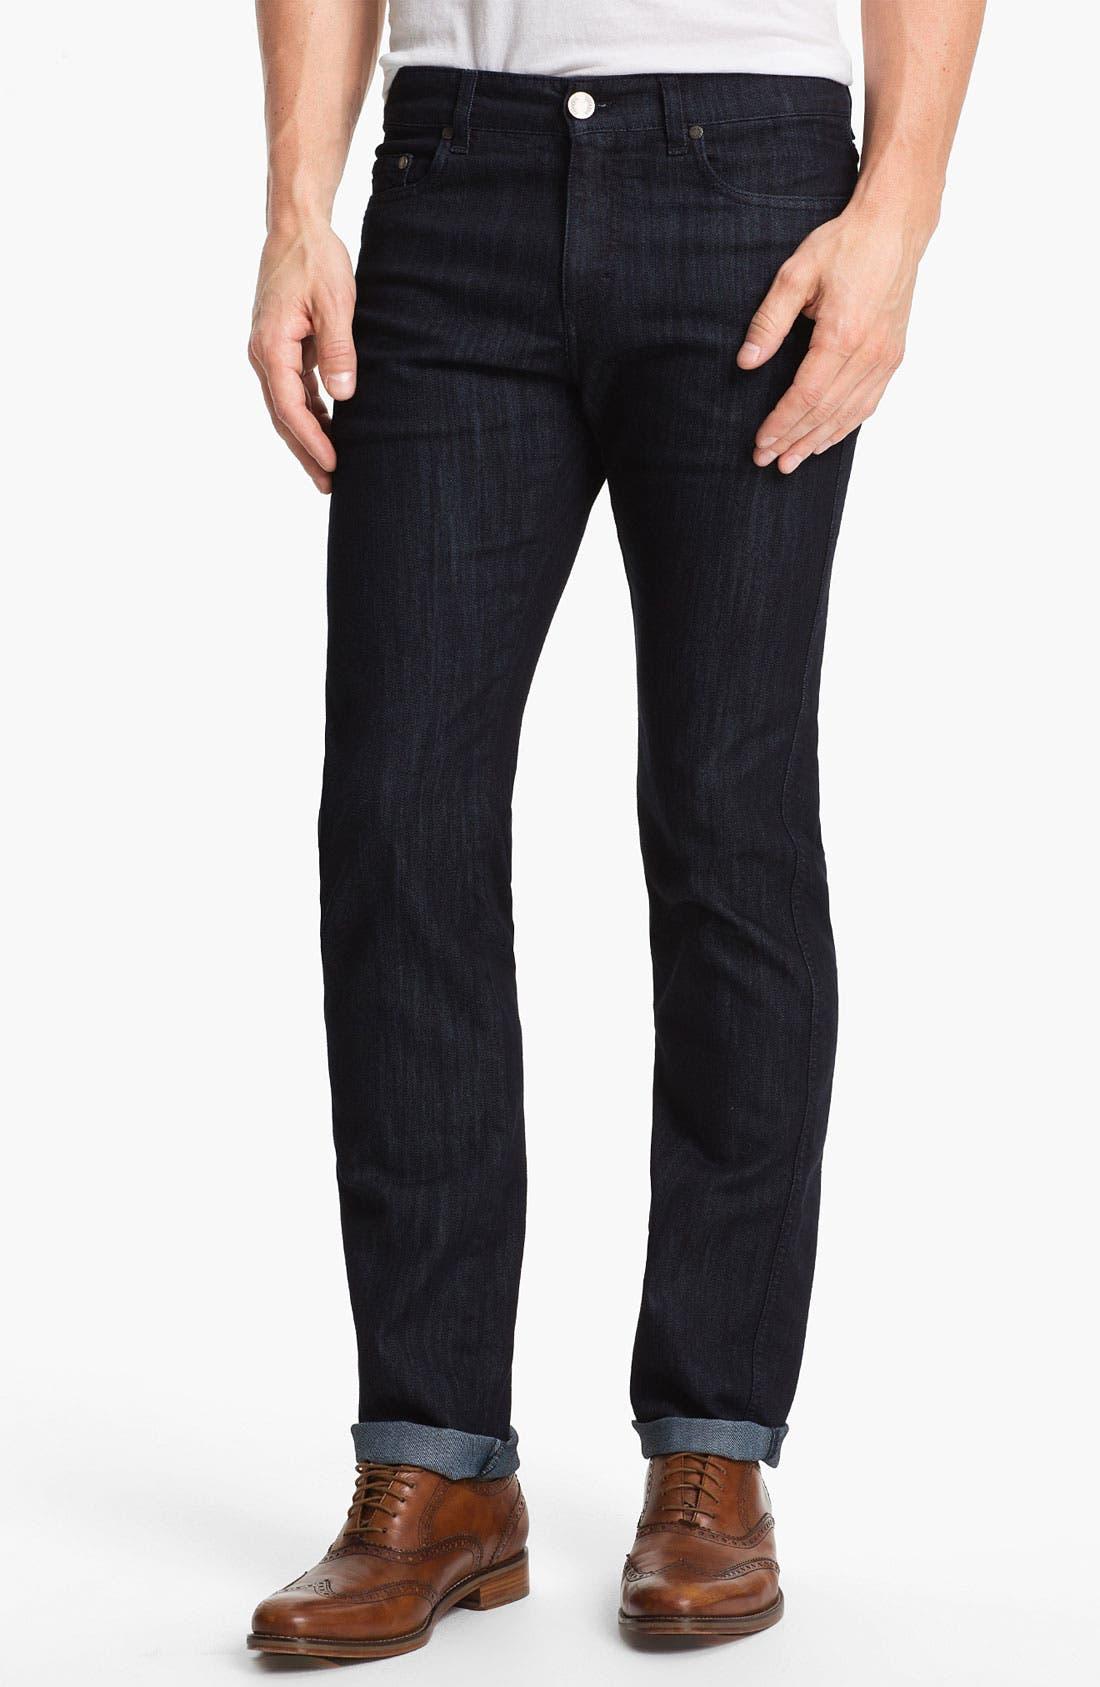 Main Image - Z Zegna 'Metalized Effect' Straight Leg Jeans (Navy)